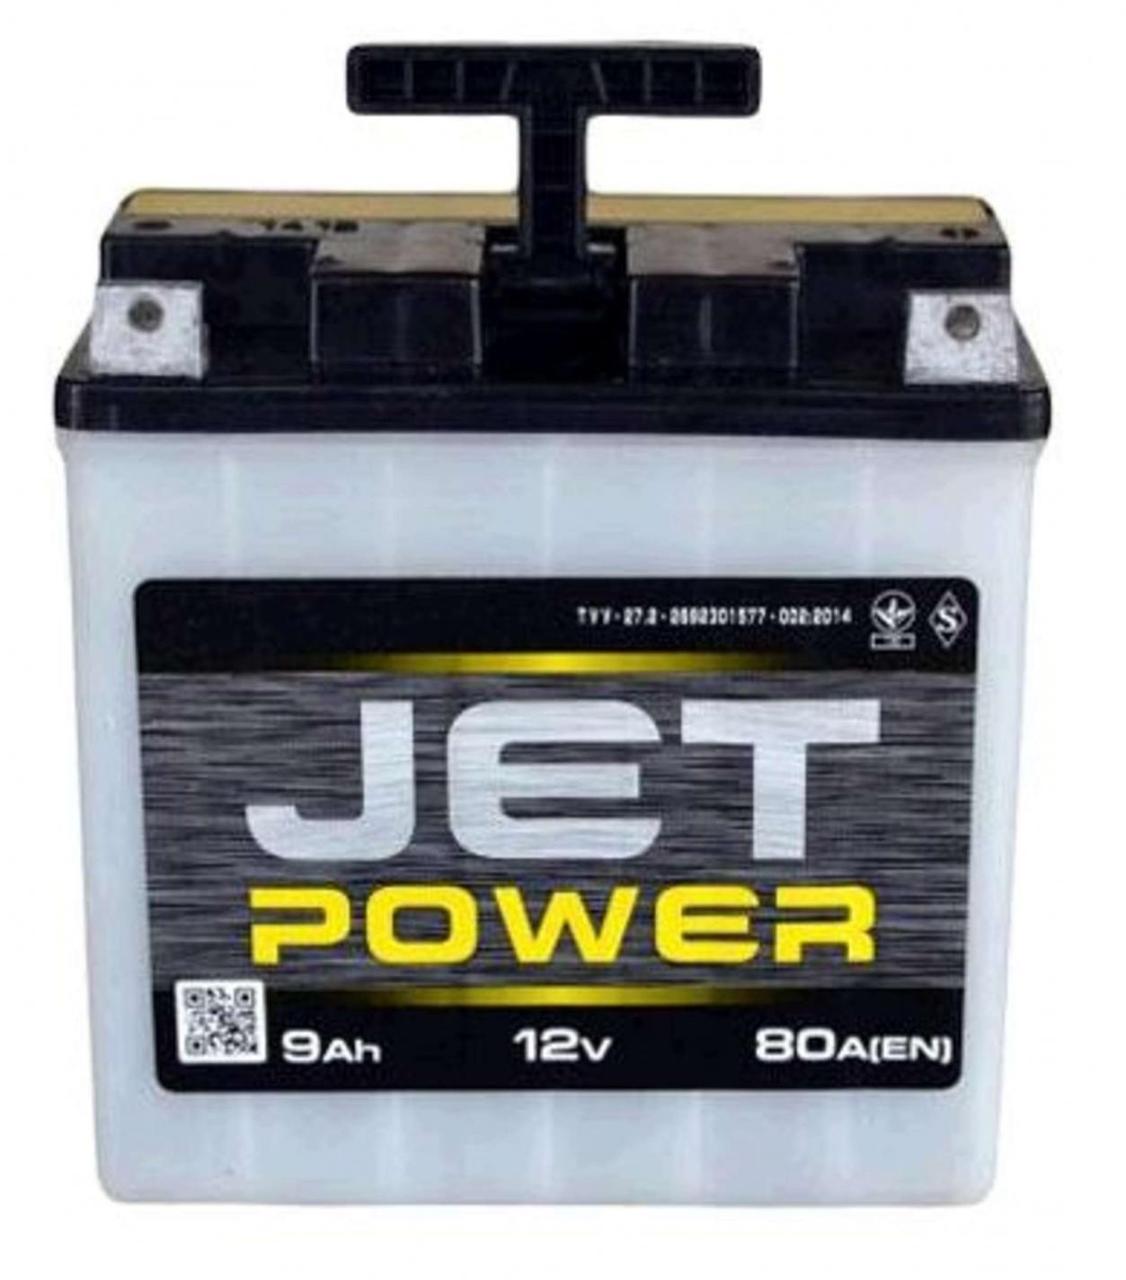 Мото аккумулятор АКБ (Аккумулятор на скутер, мотоцикл, мопед) 12В (V) 9А заливной JET POWER (под болт) (#VOV)